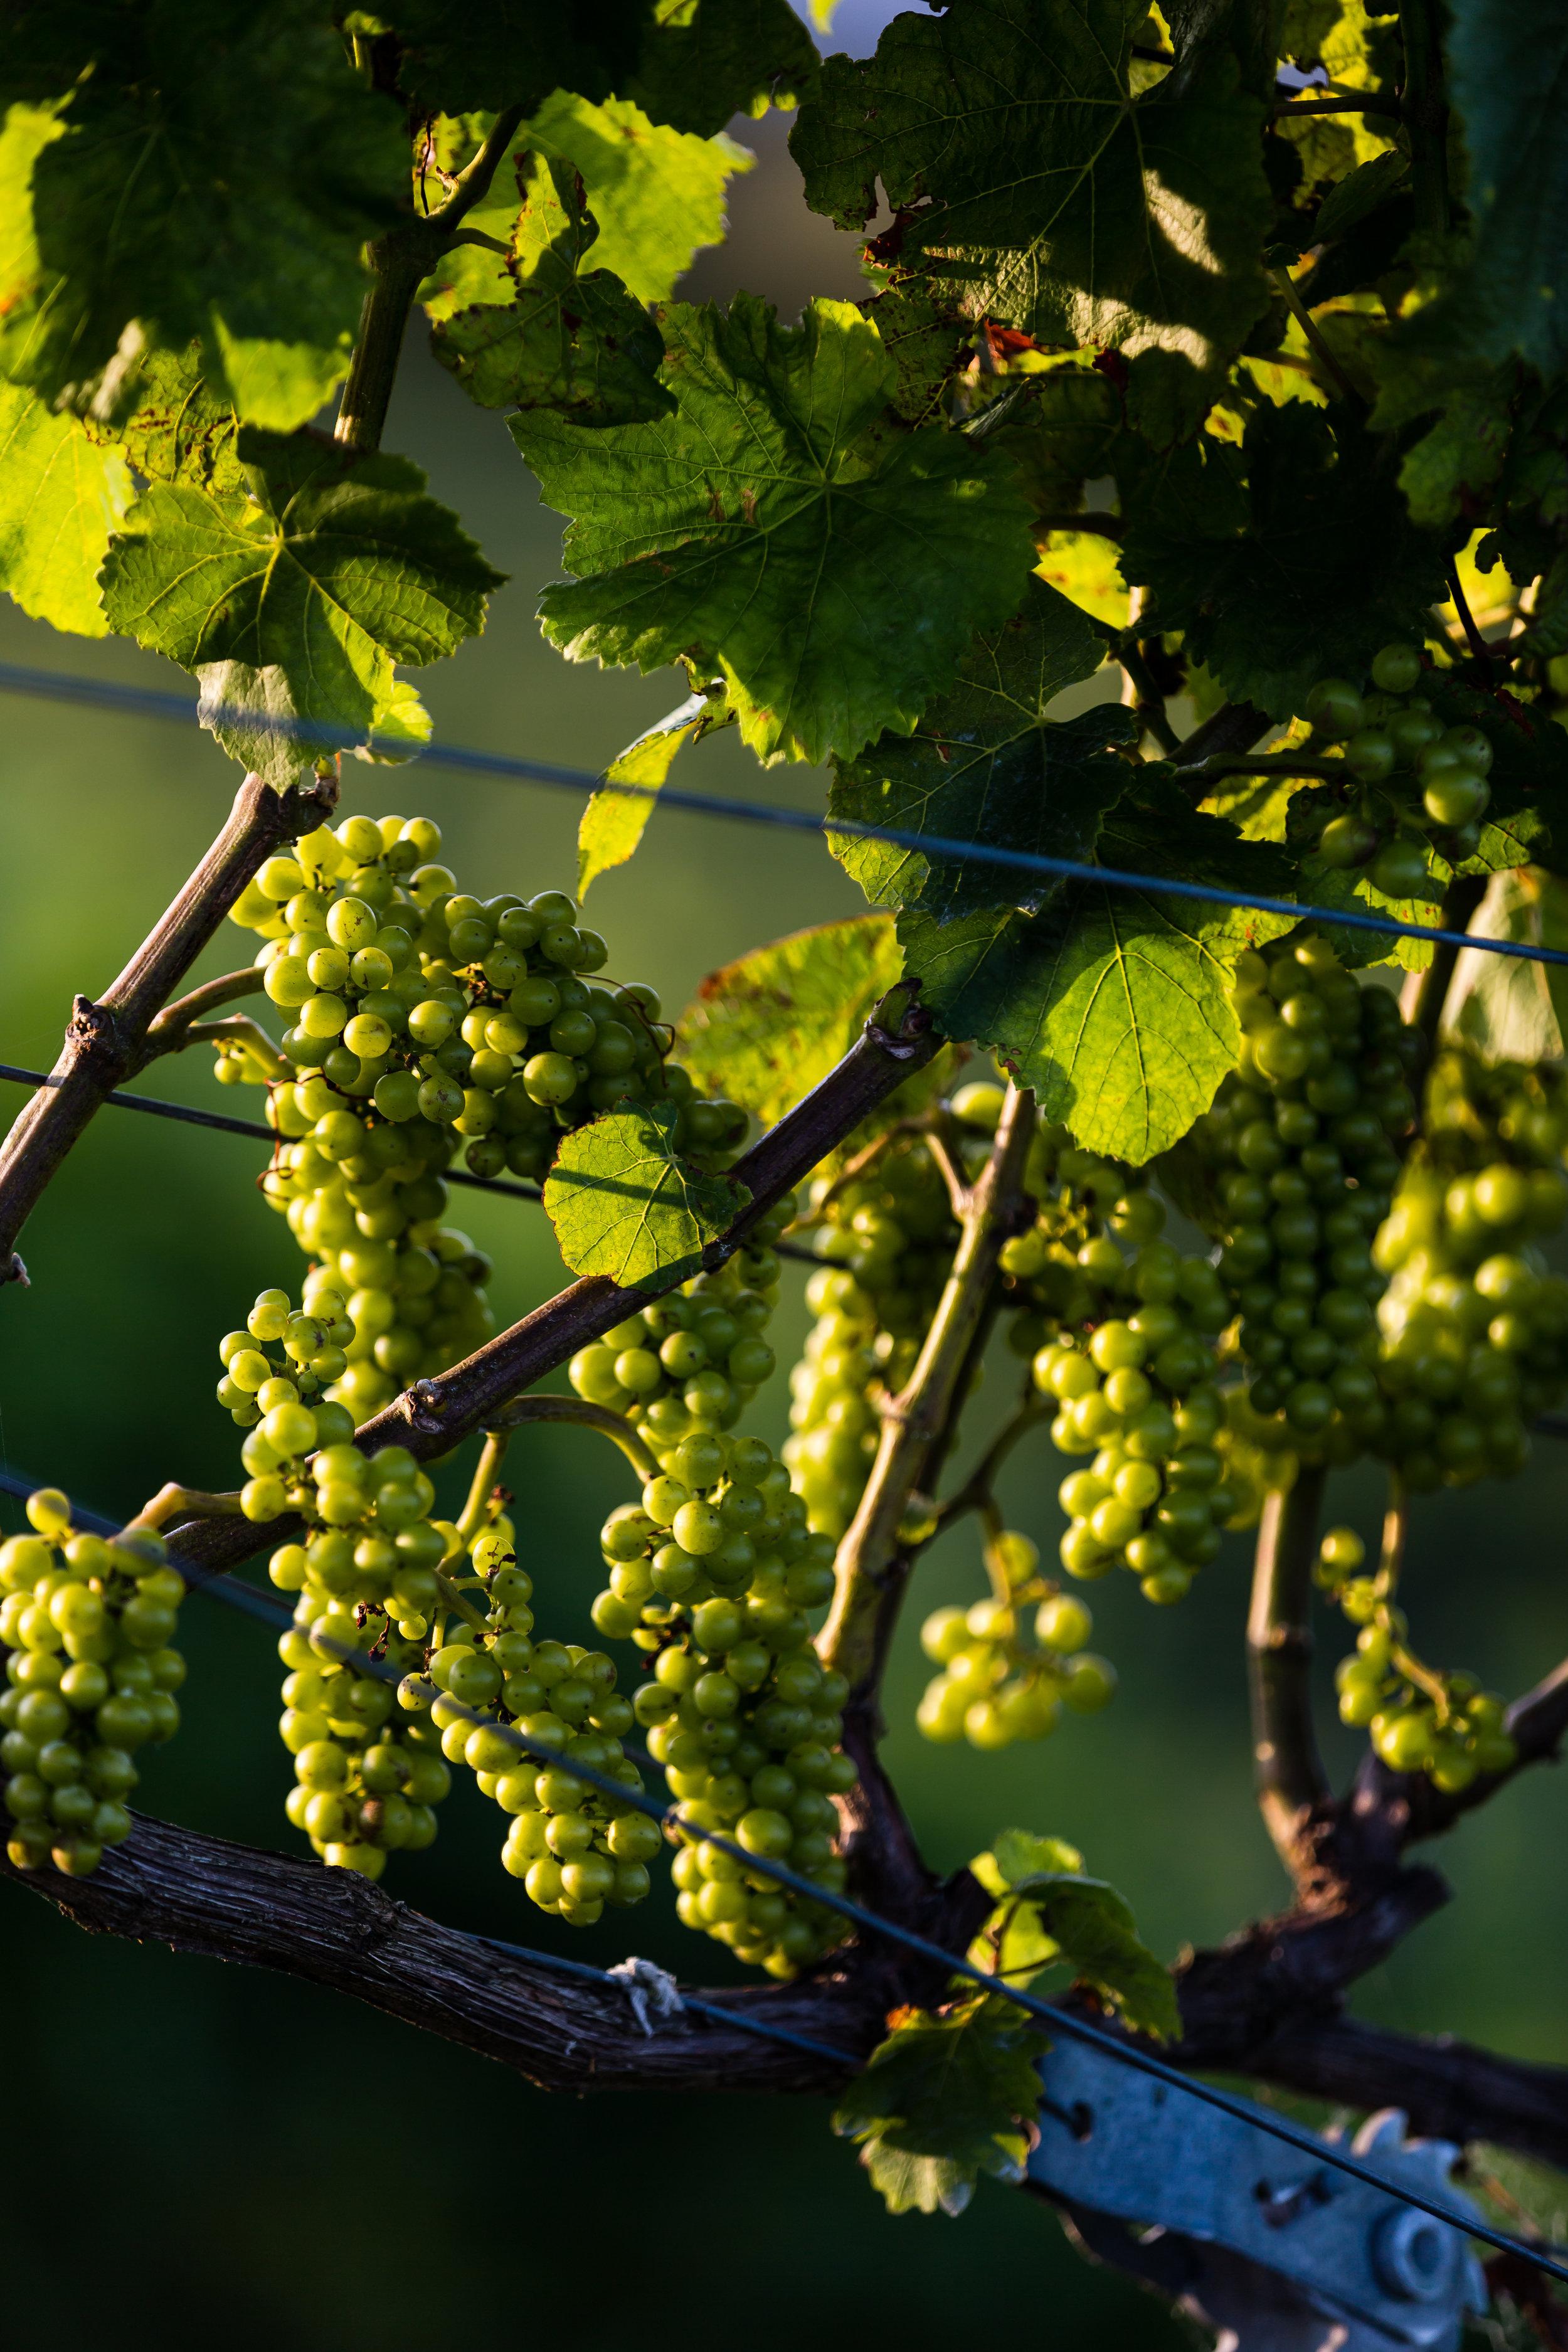 Grapes in the Paritua vineyard